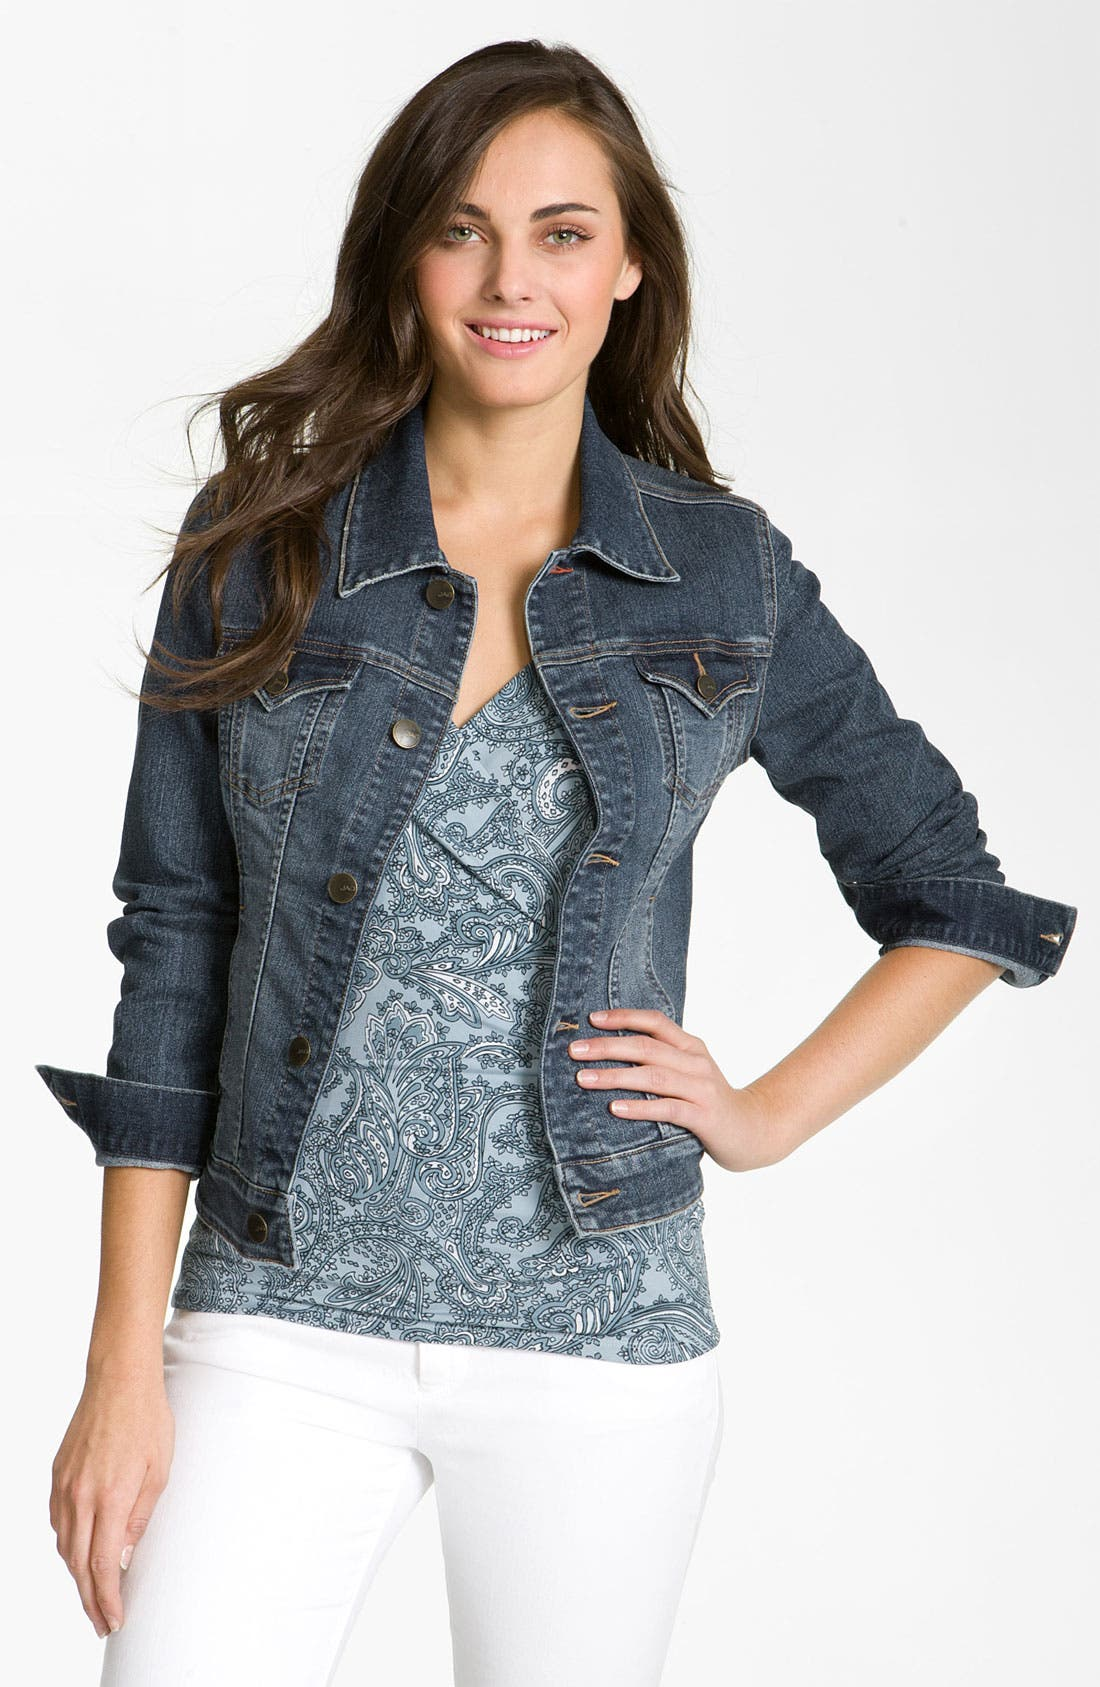 Alternate Image 1 Selected - Jag Jeans 'Rupert' Denim Jacket (Petite)